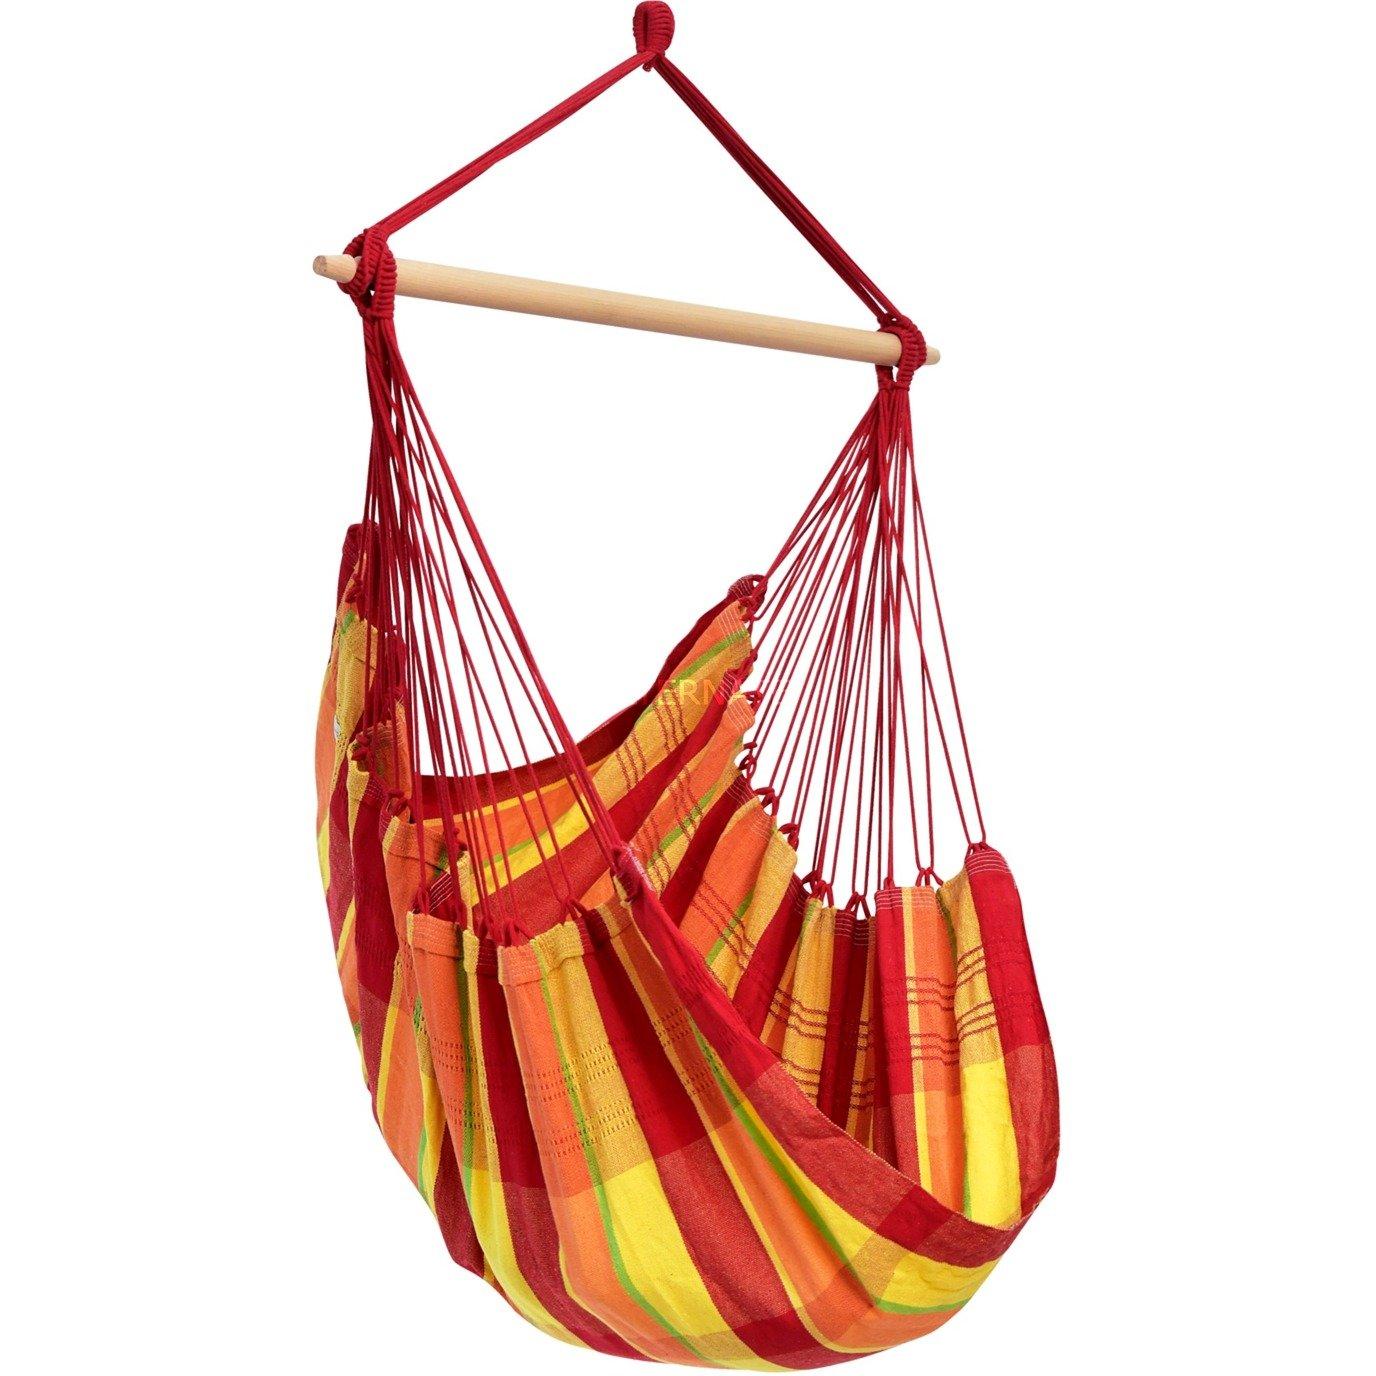 Amazonas - Basil Hanging Chair - Papaya (AZ-2030220)